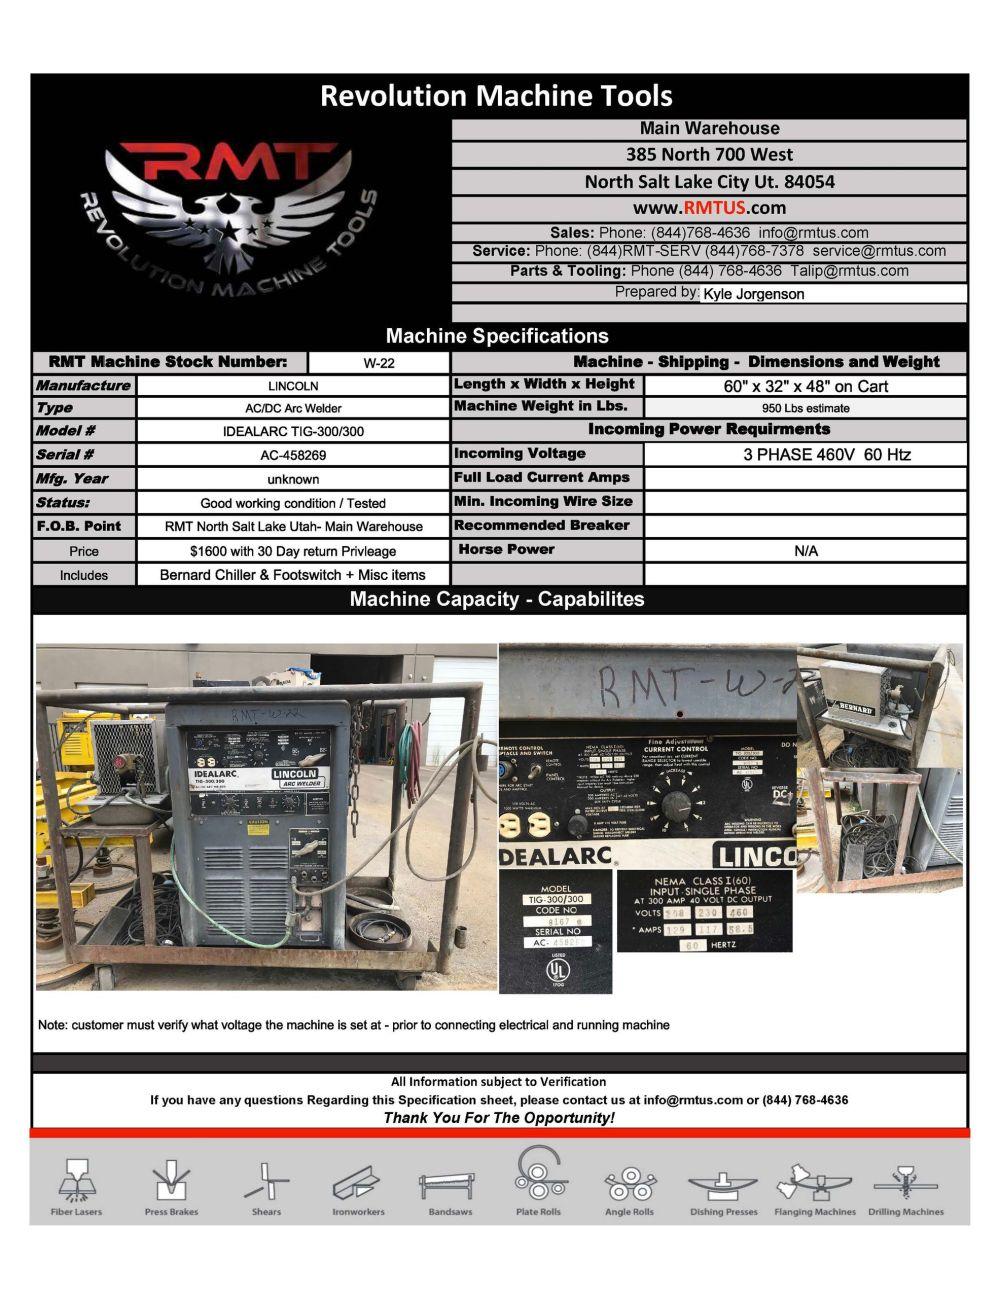 W-22 Lincoln Idealarc Tig 300 - 300